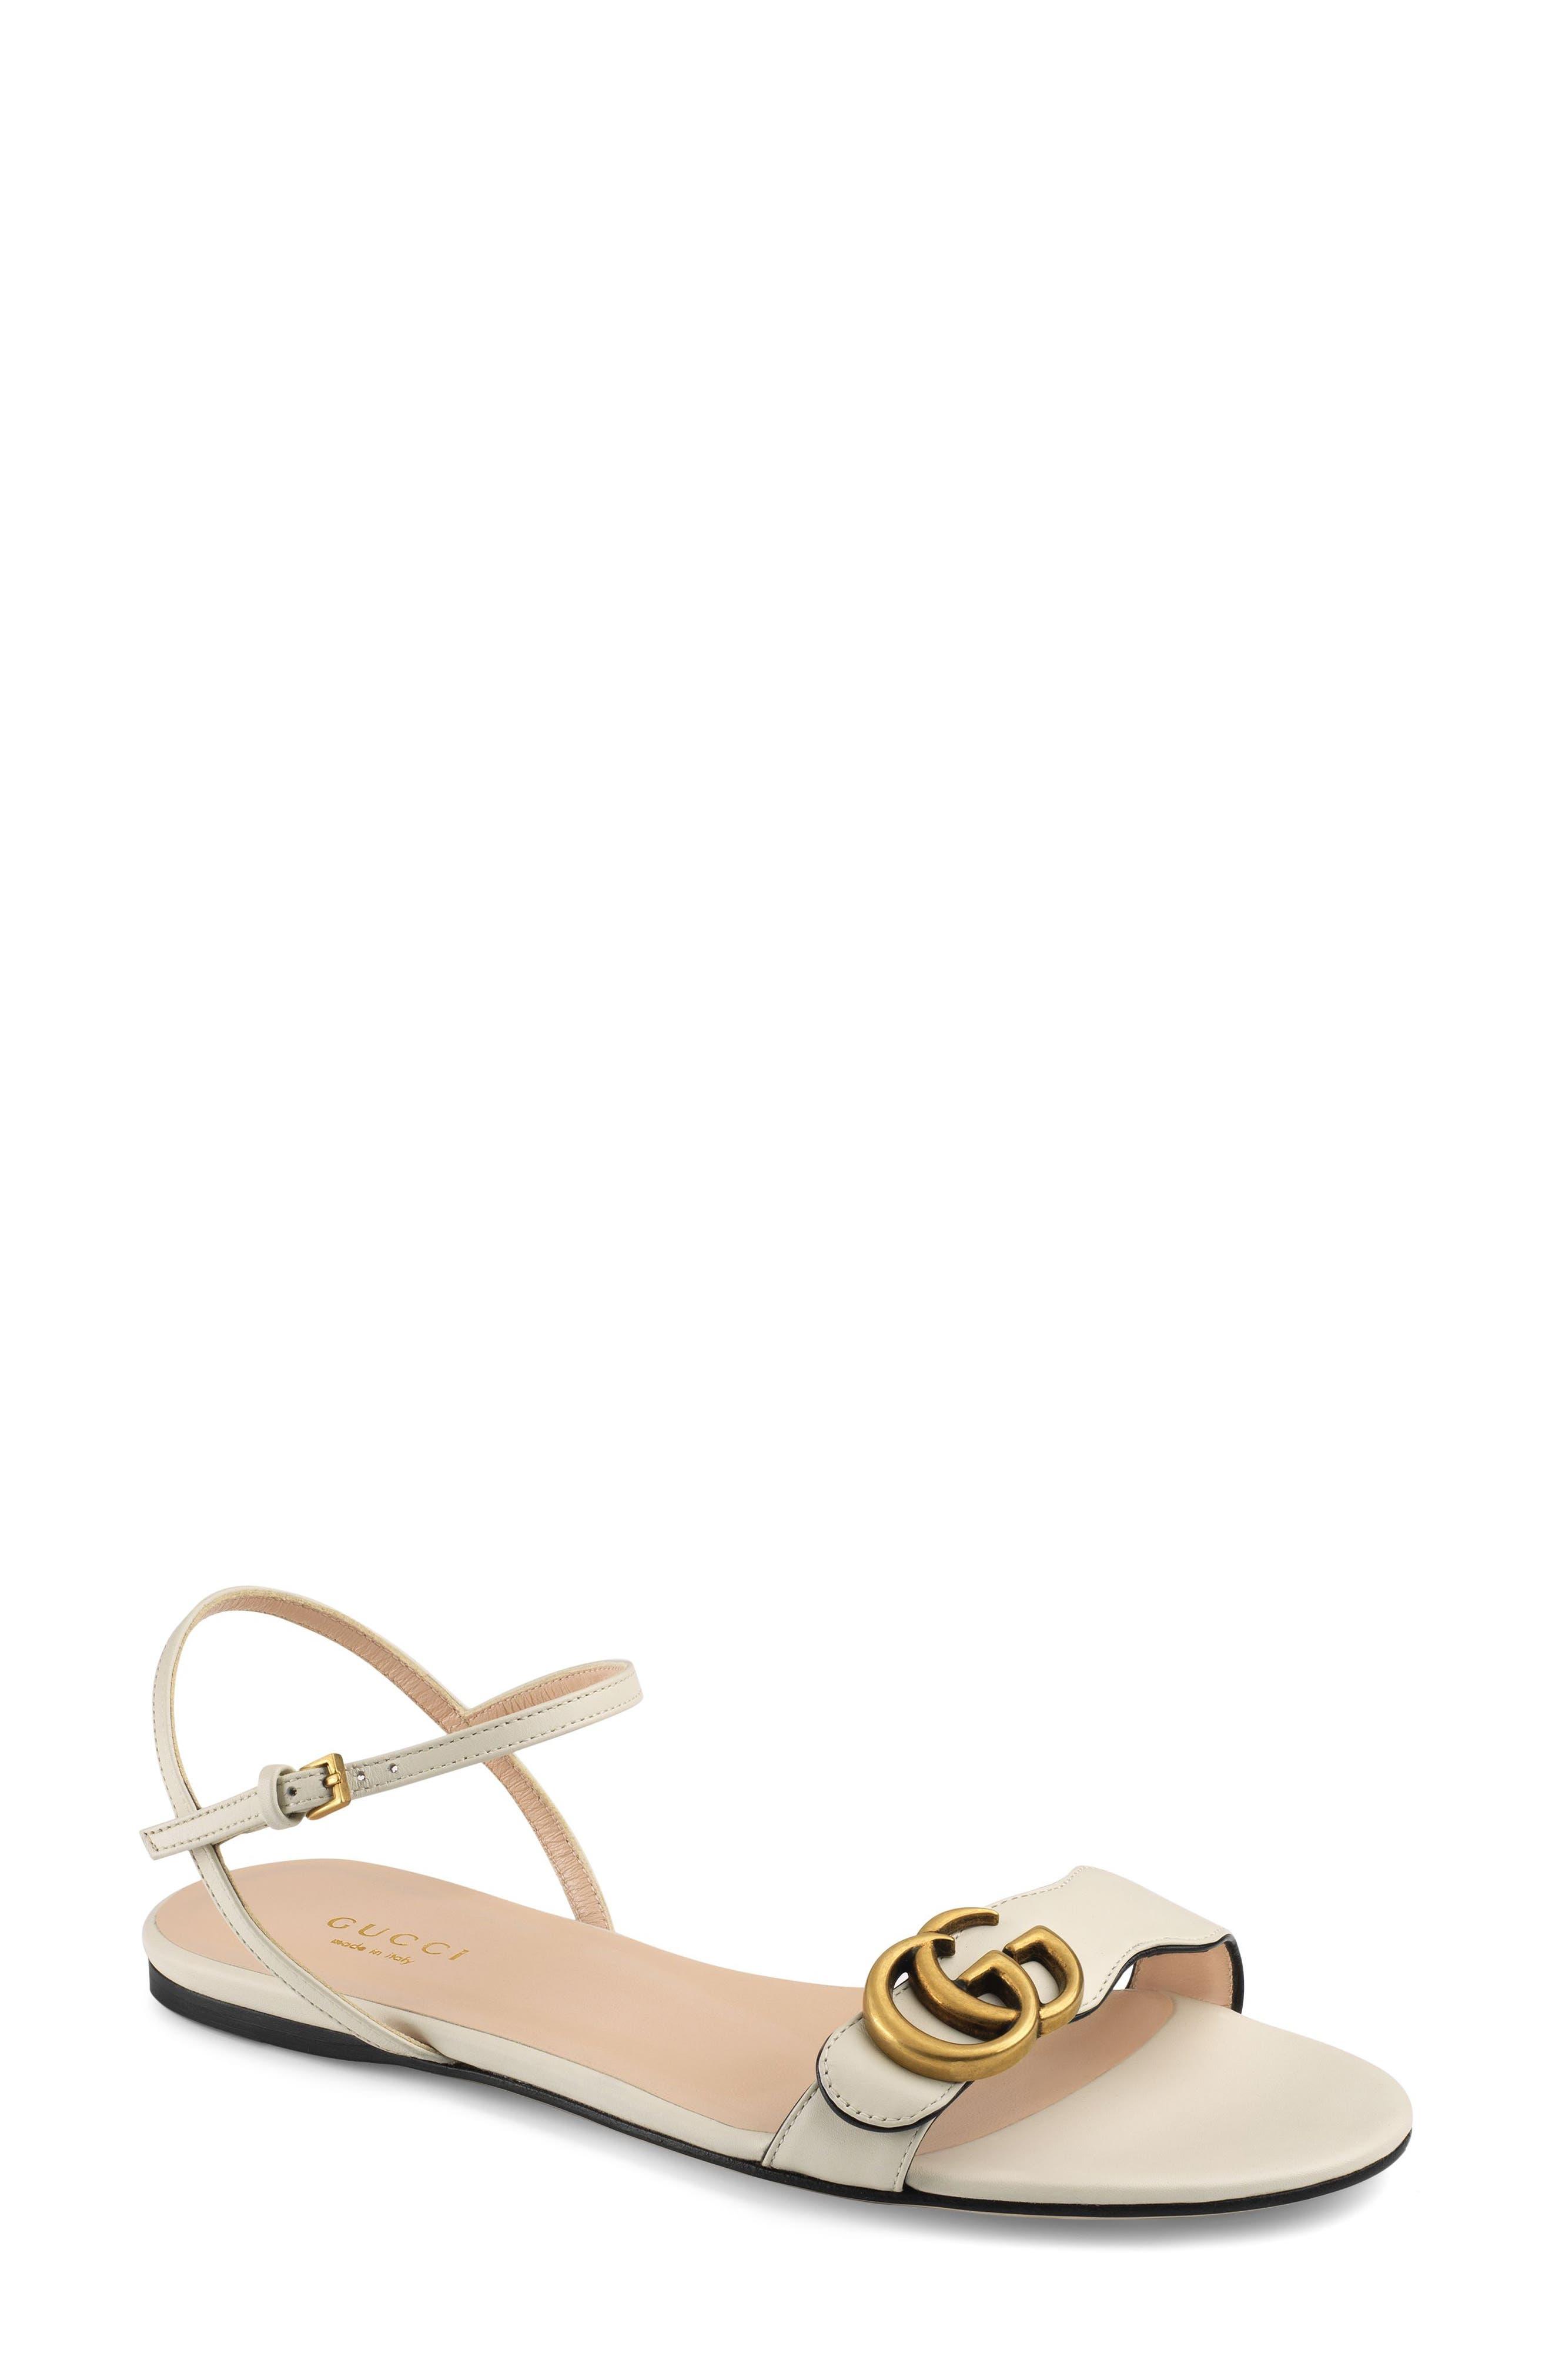 gucci sandals women